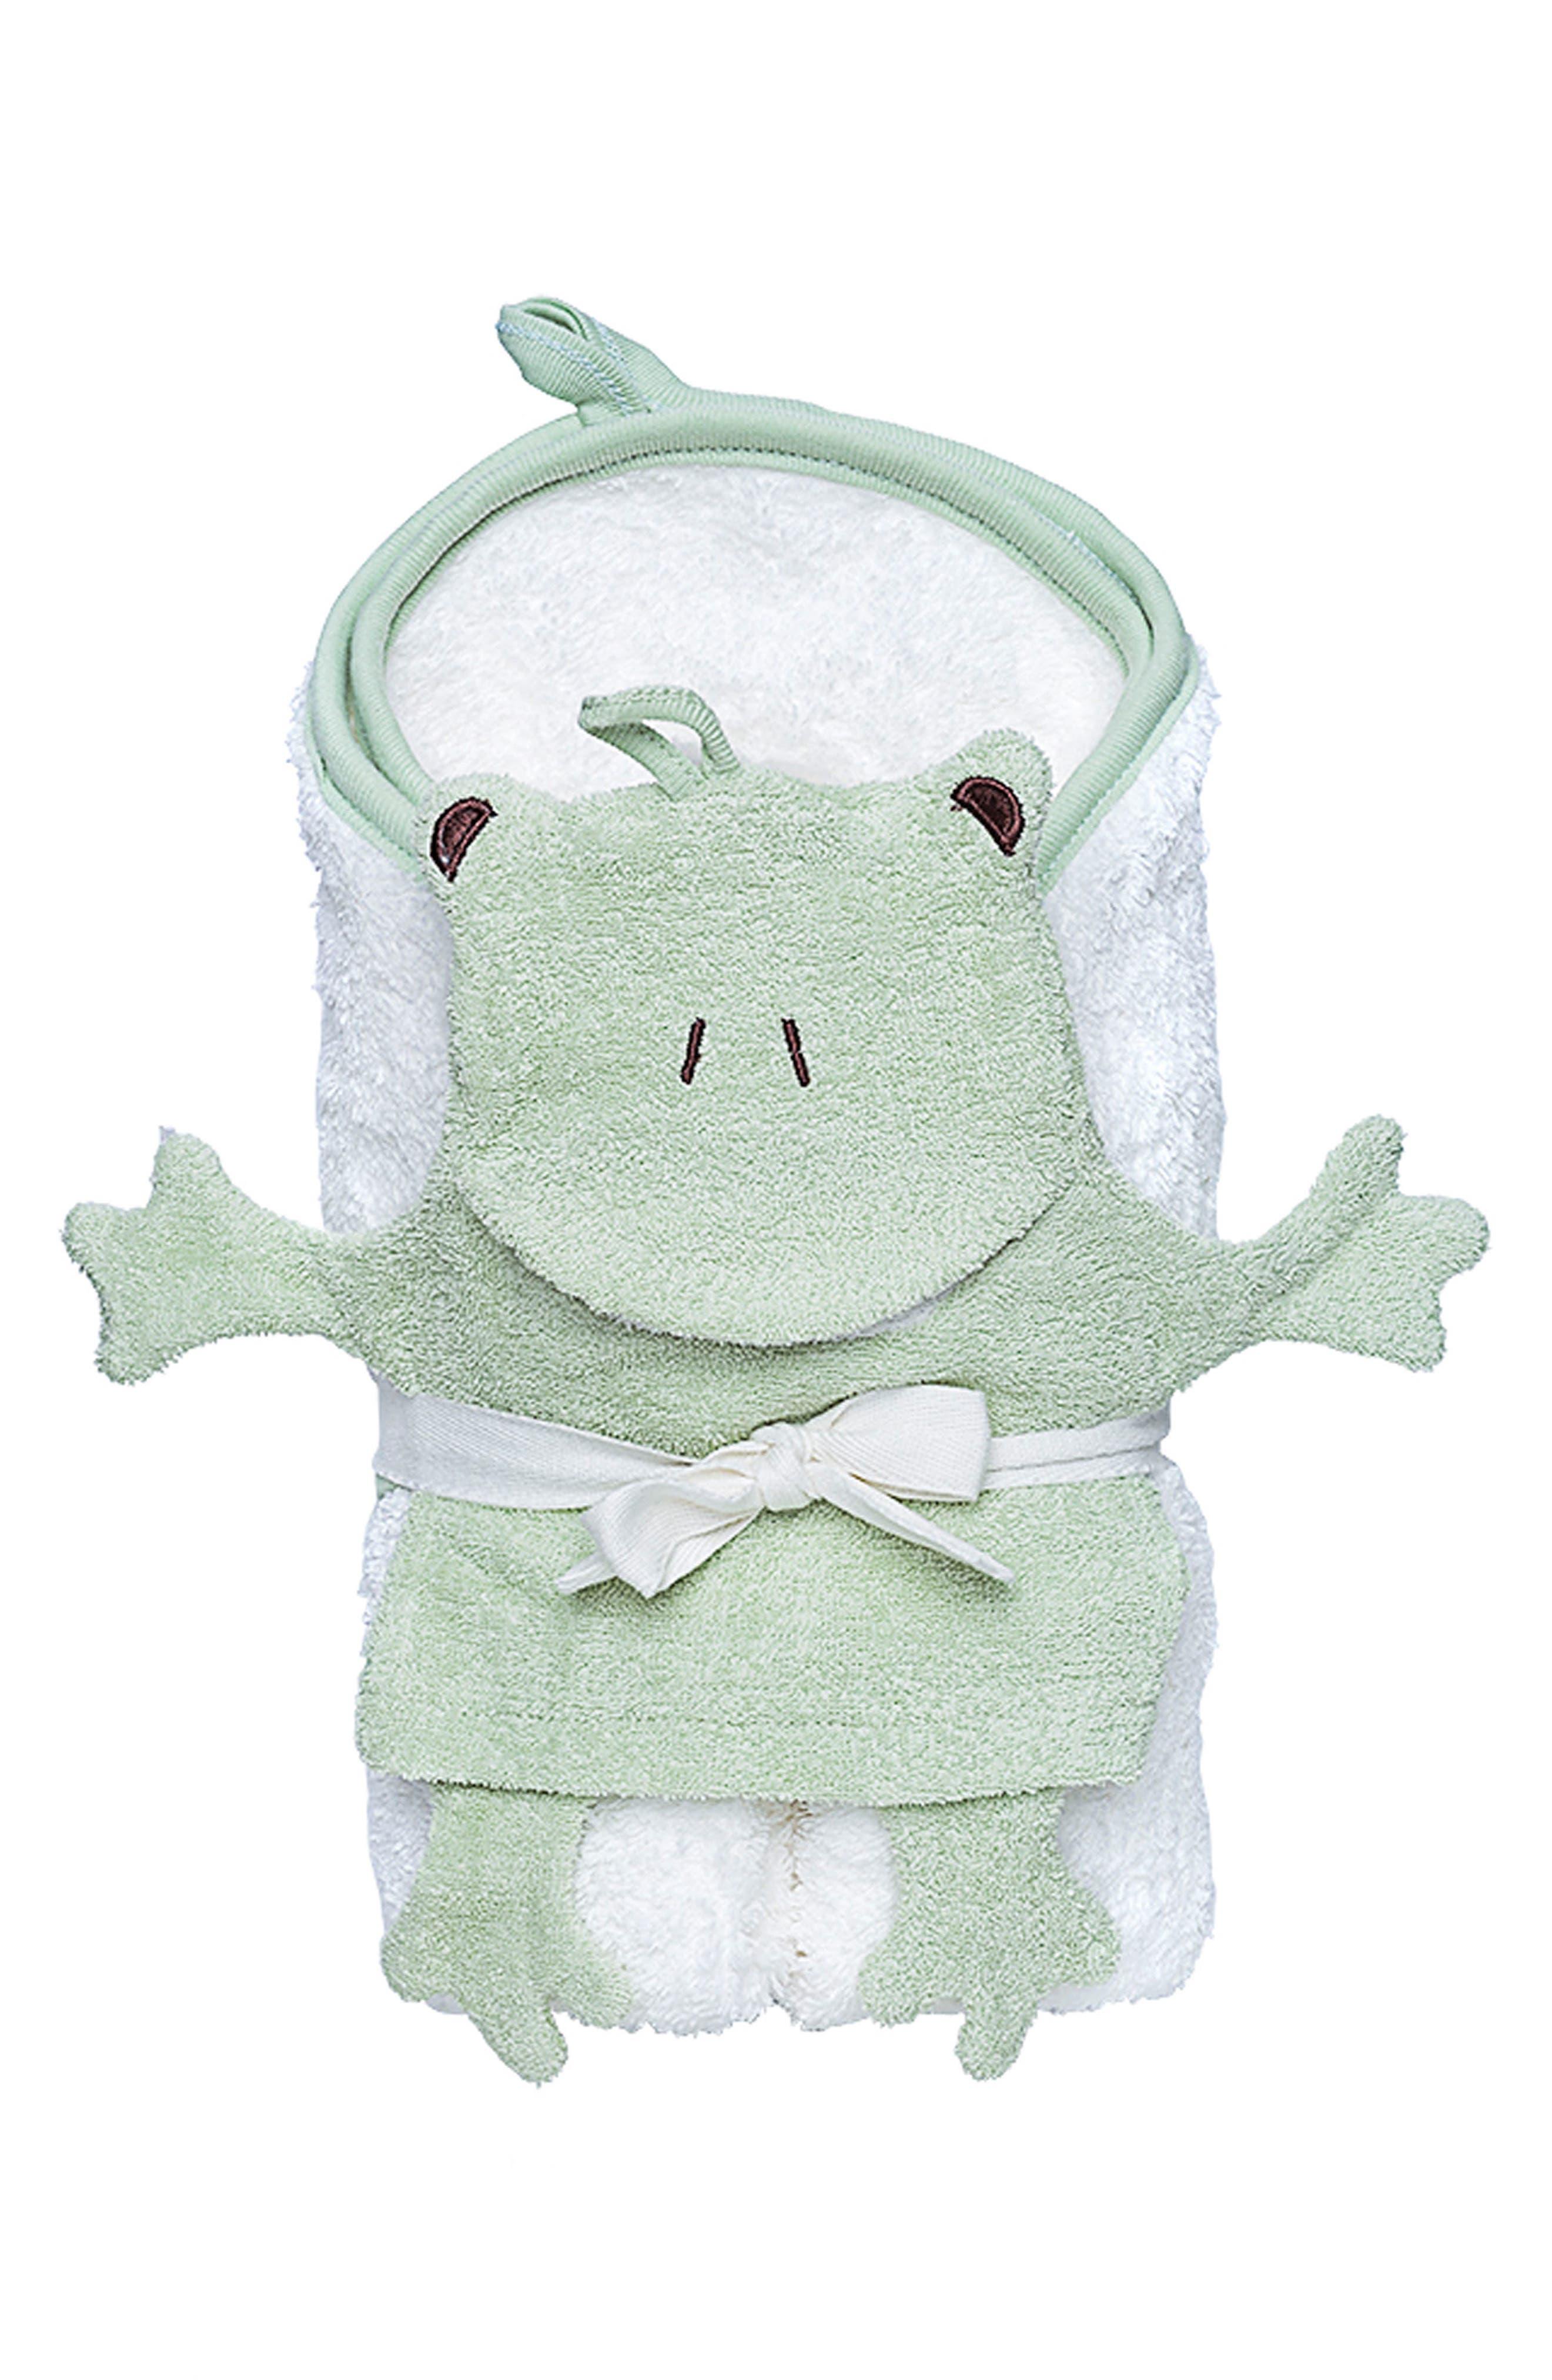 Hooded Towel & Bath Mitt Set,                         Main,                         color, Ivory